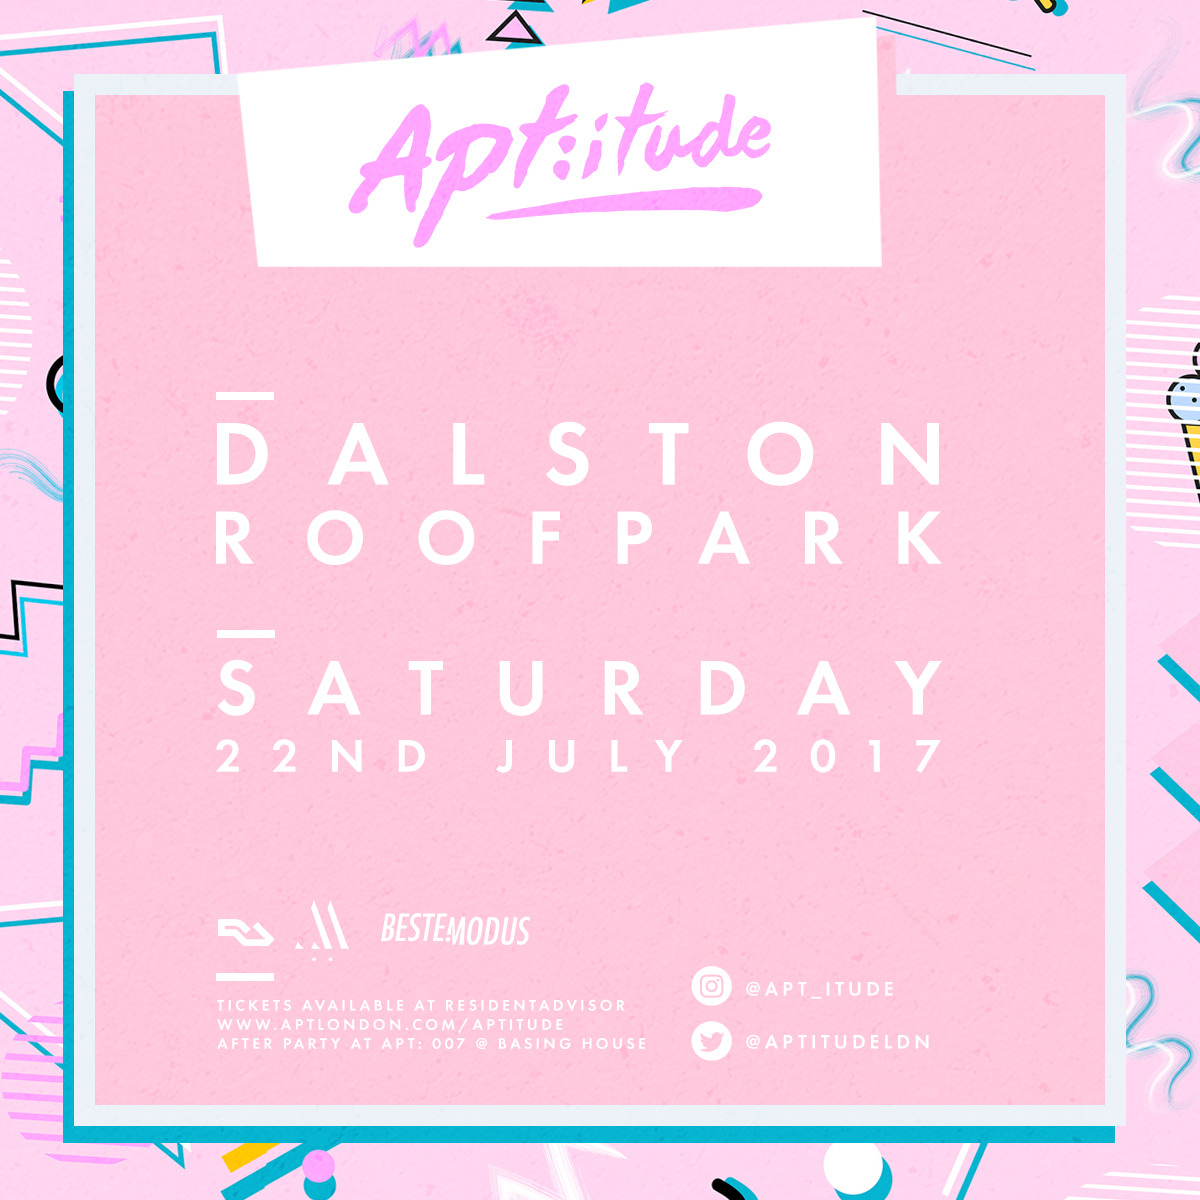 Dalston Roofpark